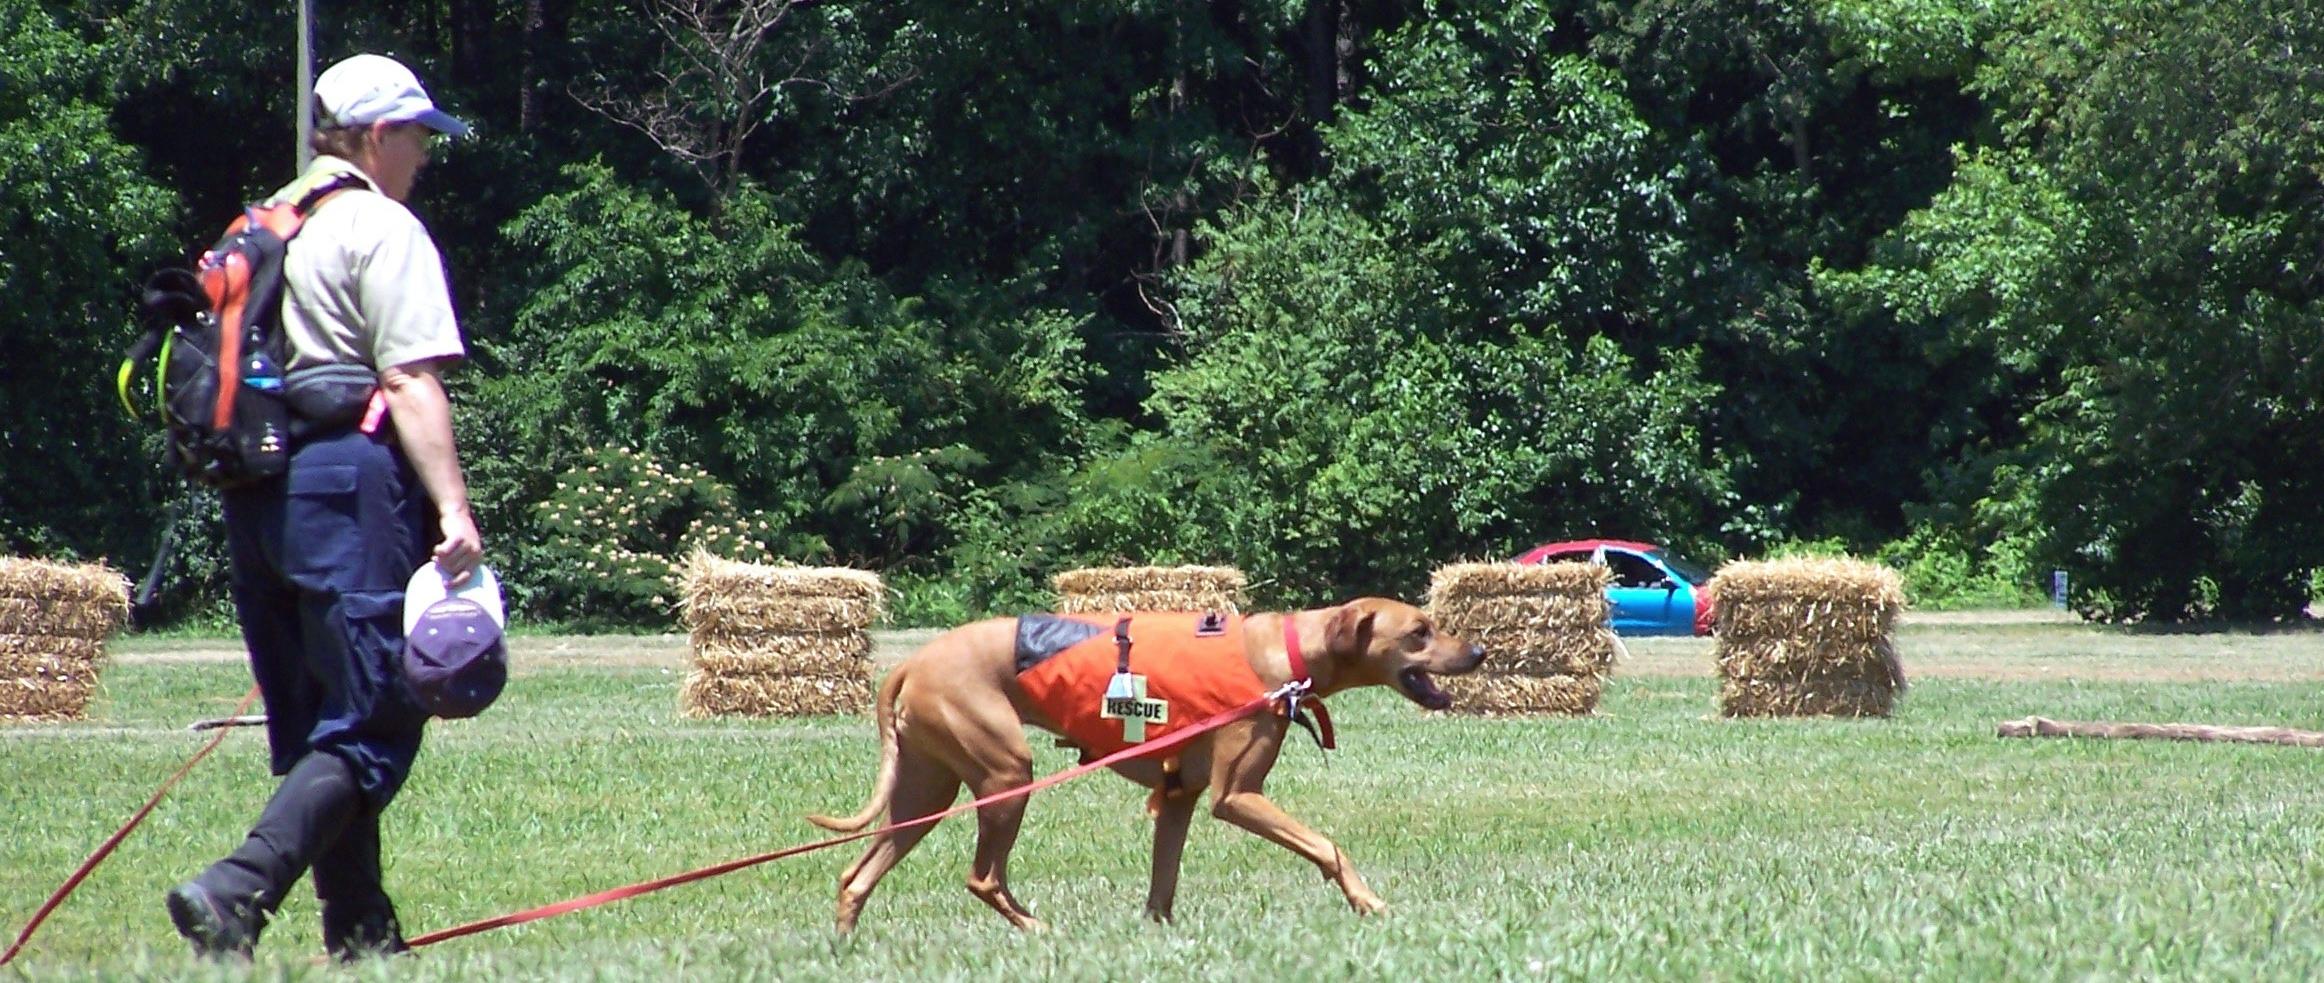 kobe and kim trailing dogdemo 7 6-24-05 (2).jpg